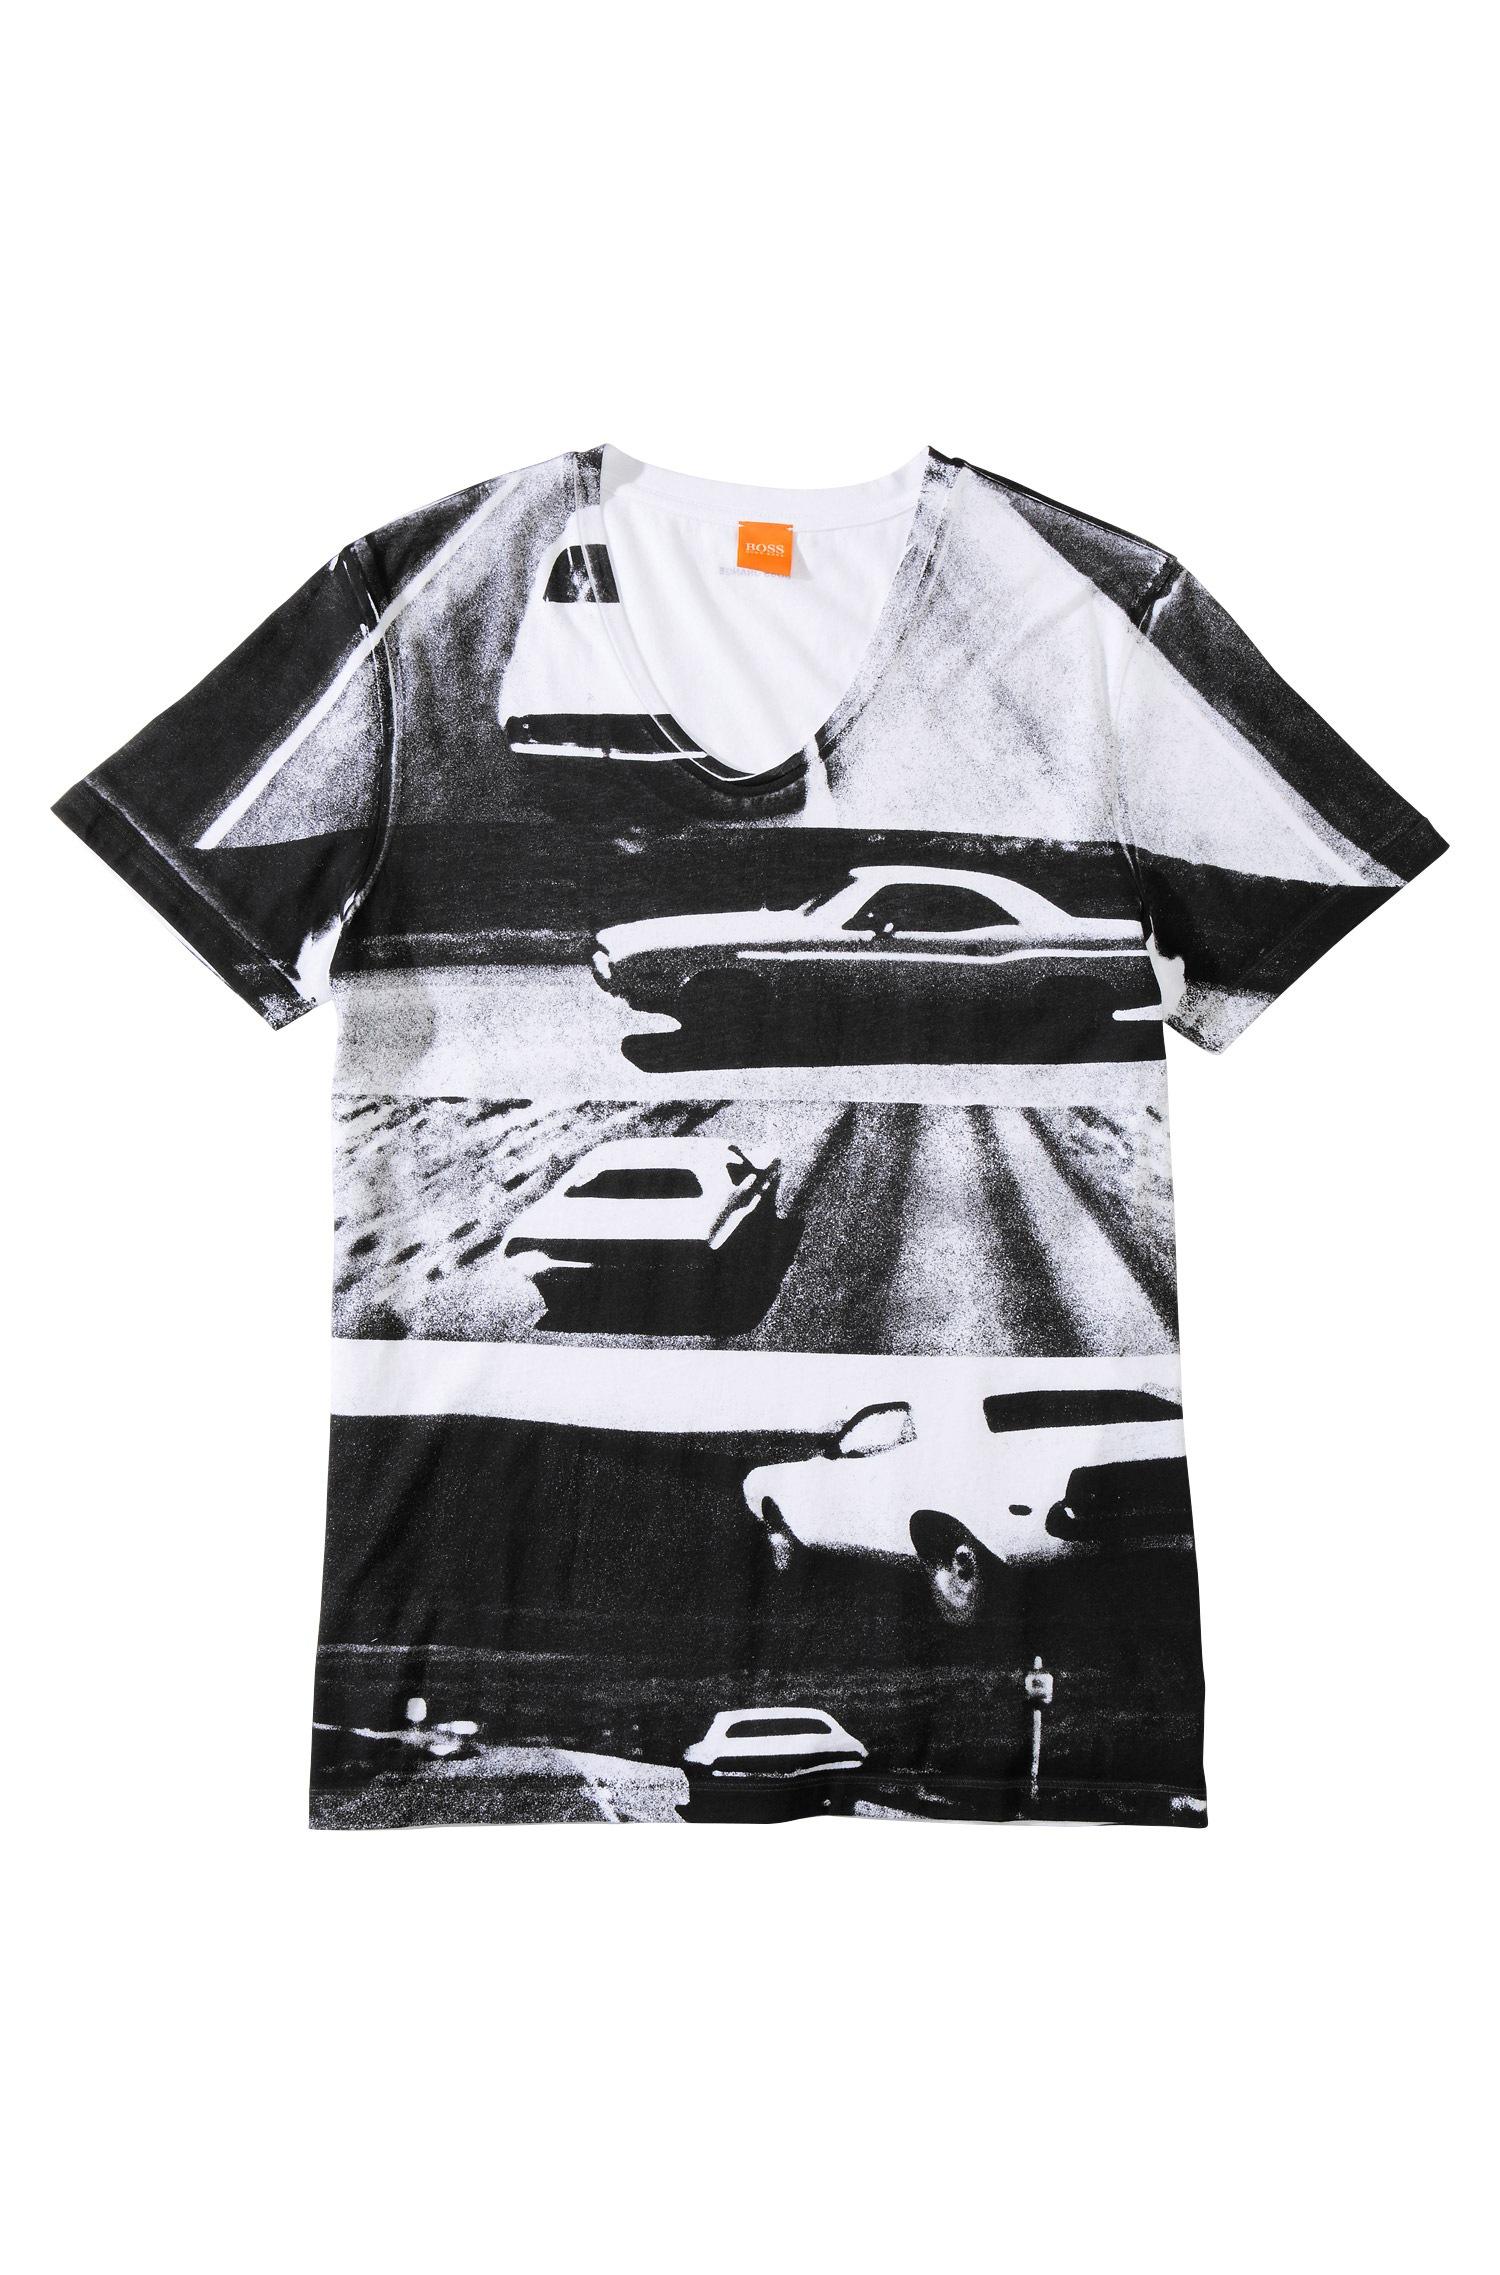 Lyst Boss Orange T Shirt 39 Tucon 1 39 With V Neck In Black